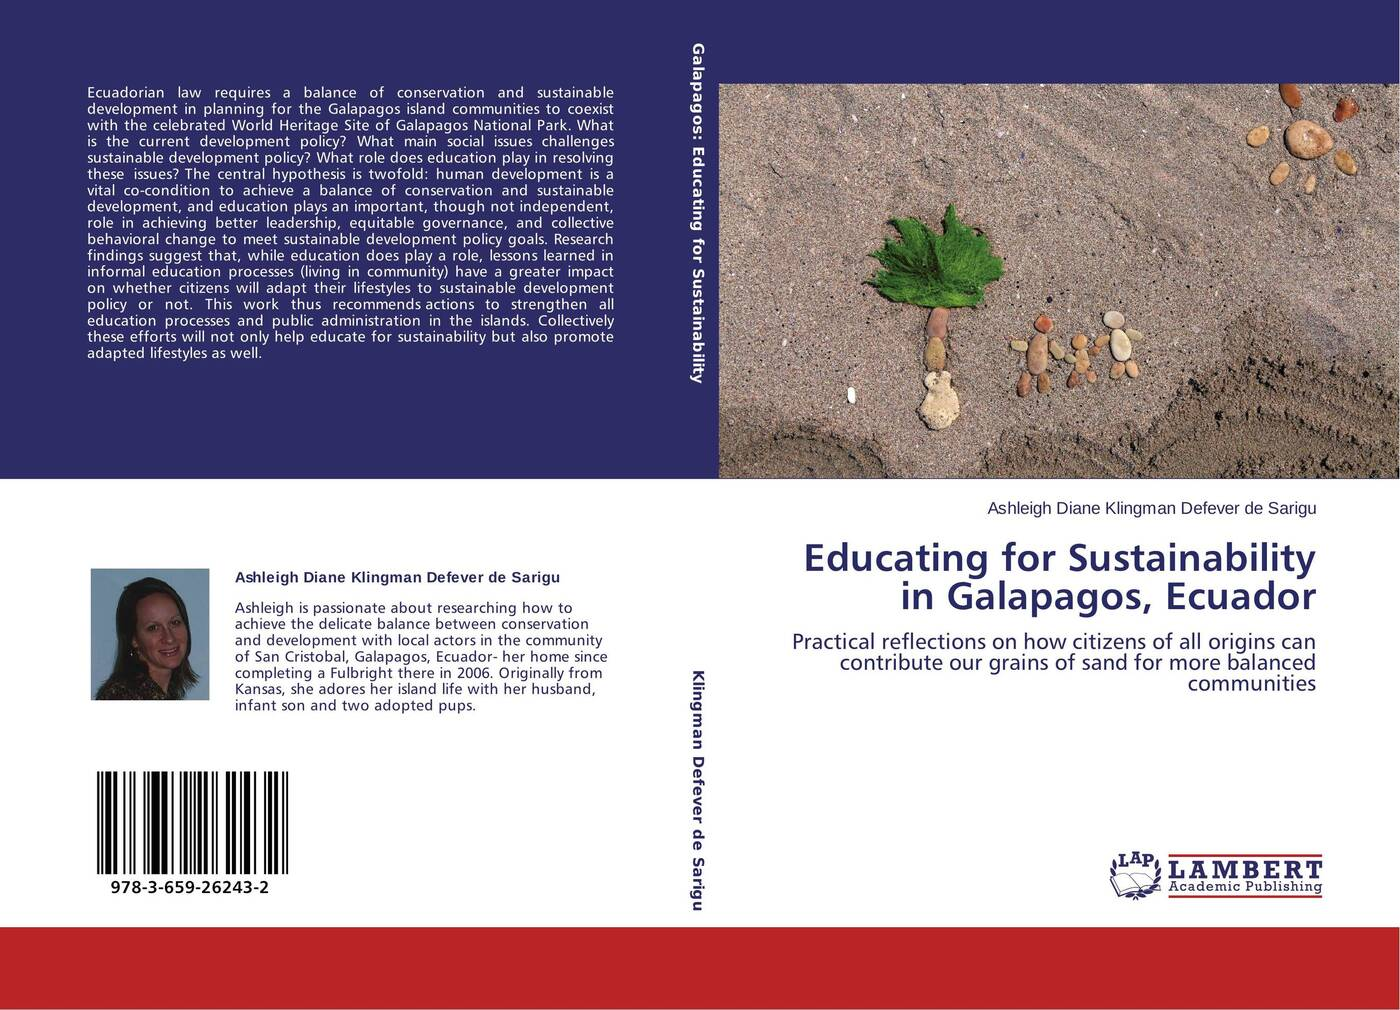 Ashleigh Diane Klingman Defever de Sarigu Educating for Sustainability in Galapagos, Ecuador juntunen marianne aksela maija holistic education for sustainable development in chemistry